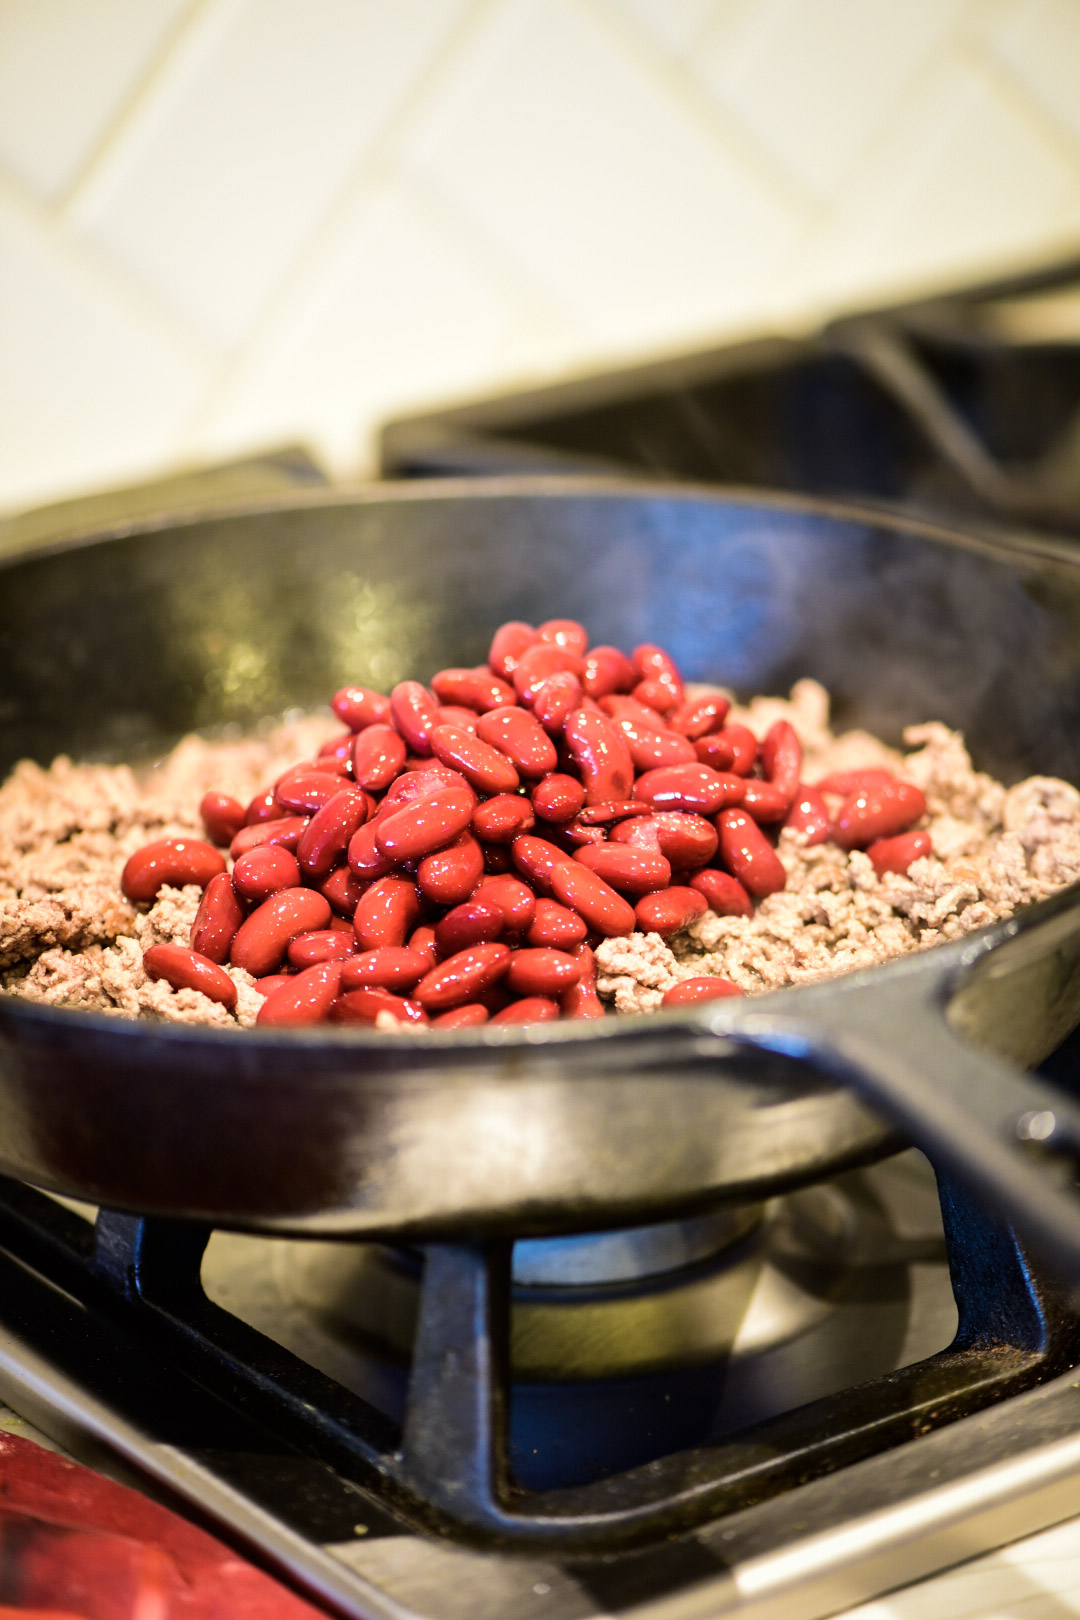 Adding beans to ground beef mixture